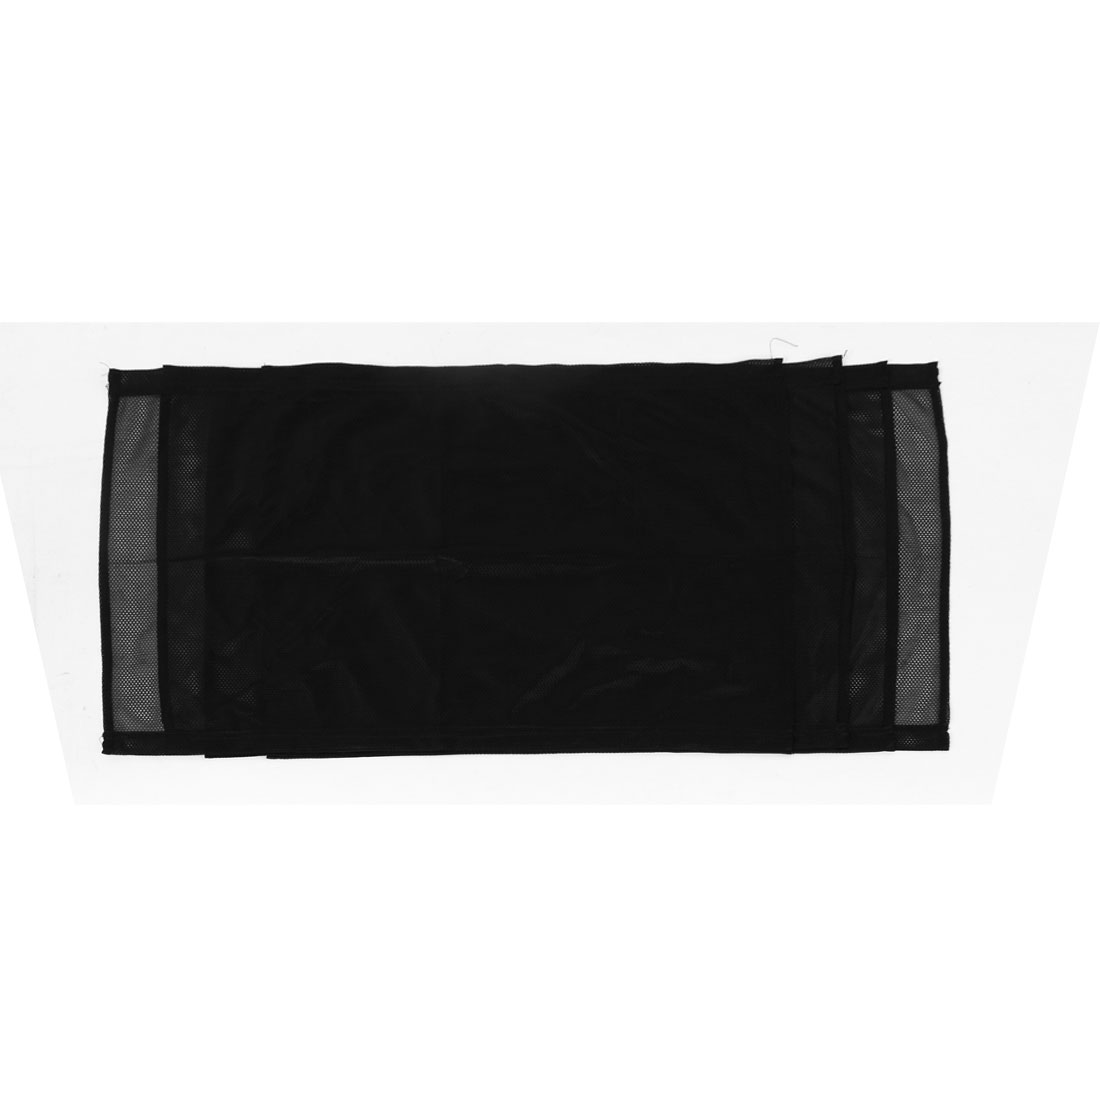 70cm x 47cm Black Retractable Meshy Rear Side Window Sun Shade 2 Pairs